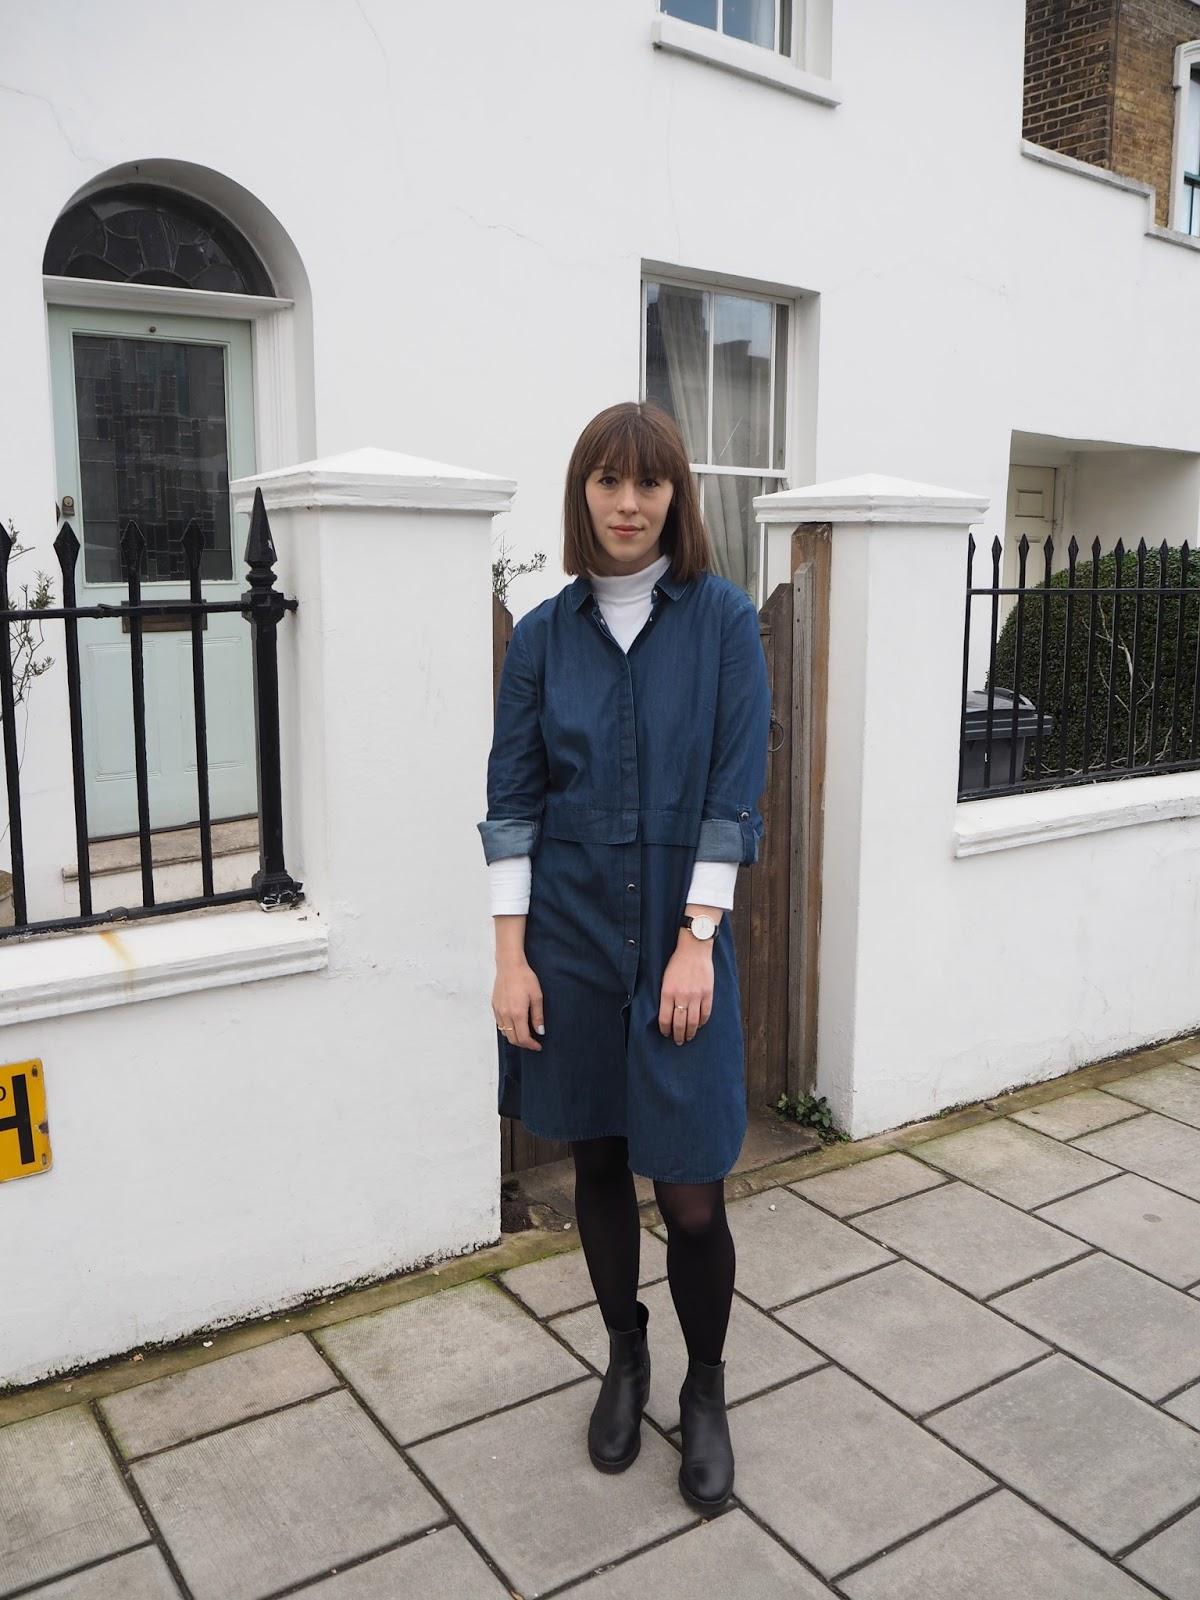 LFW AW16 denim shirt dress and blue faux fur outfit